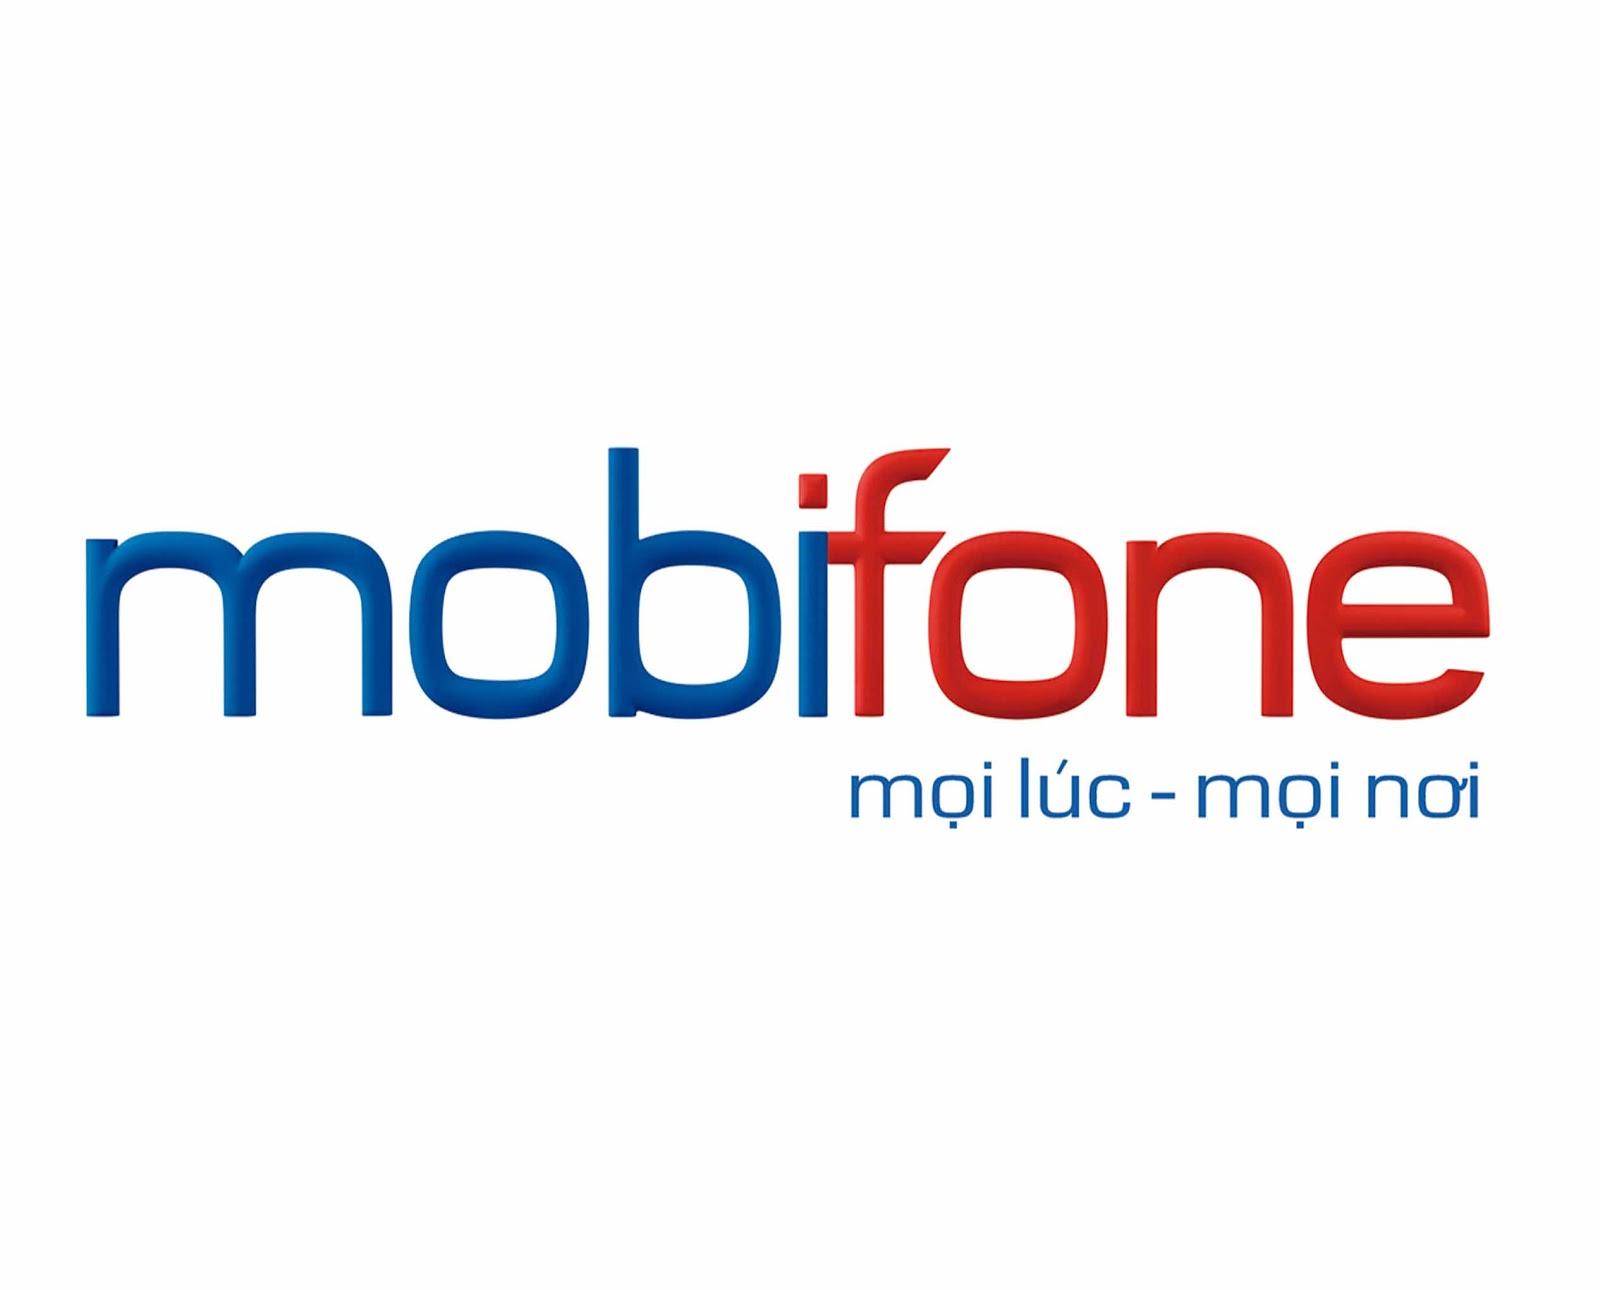 logo mobifone đẹp